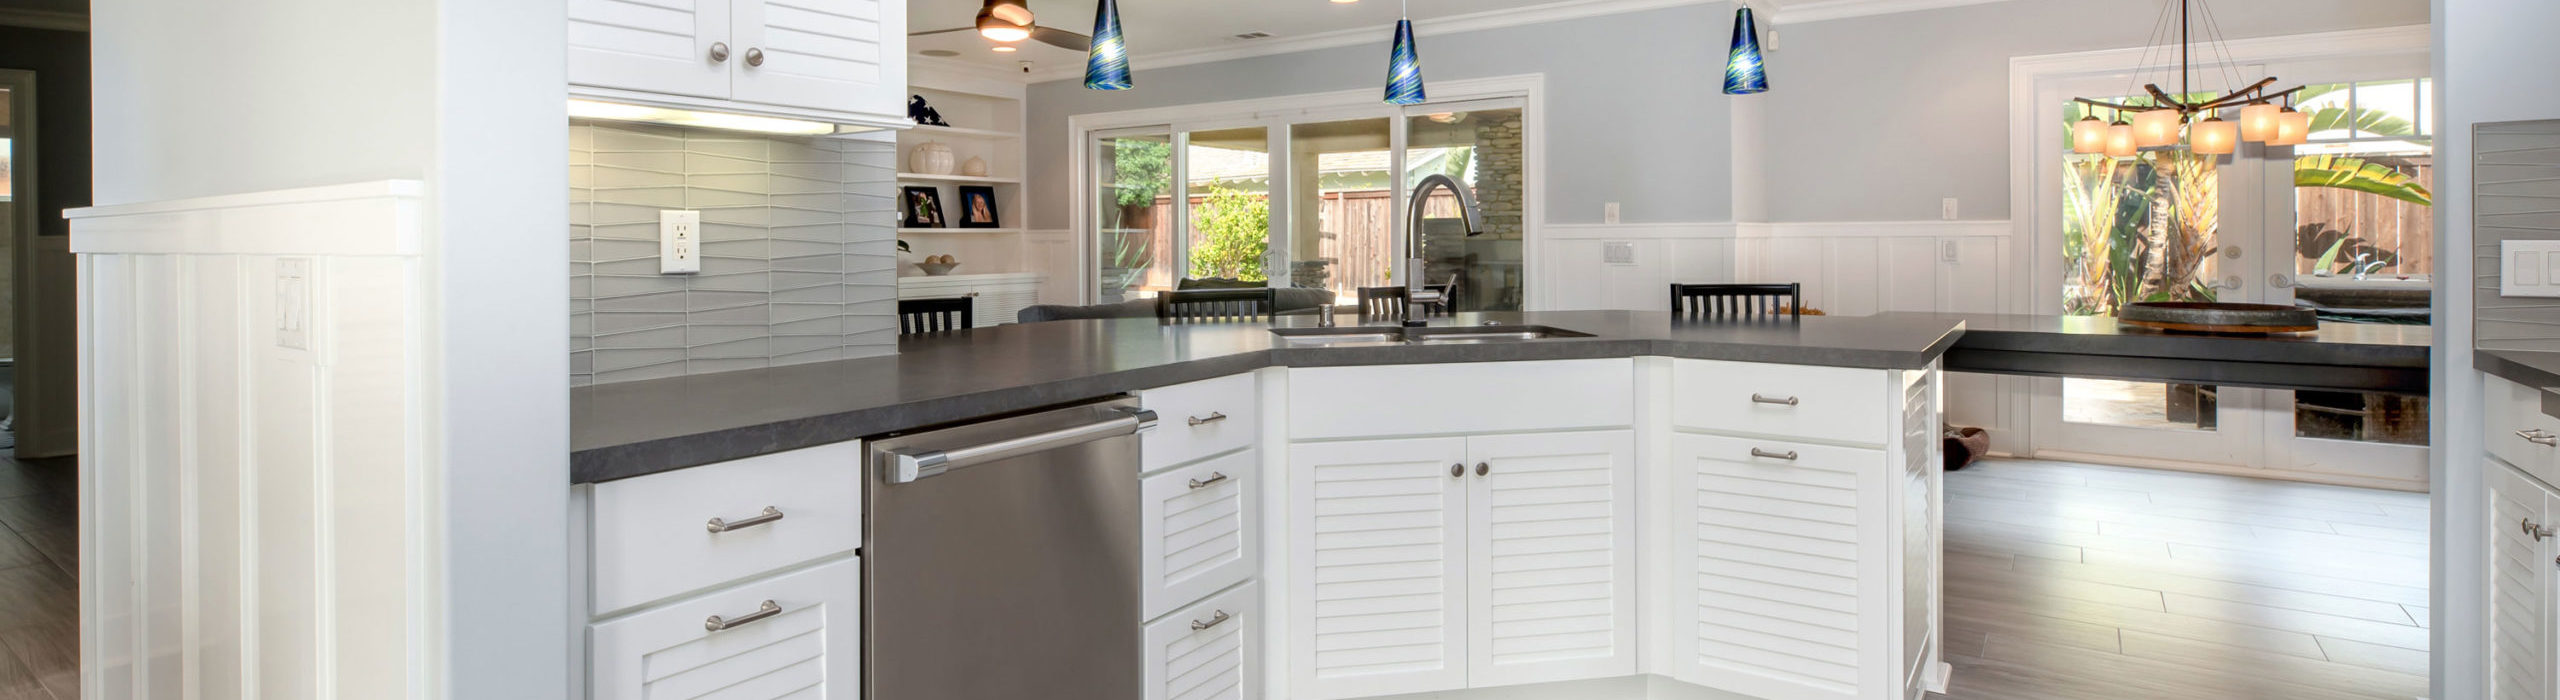 Kitchen Remodeling in Orange County, CA